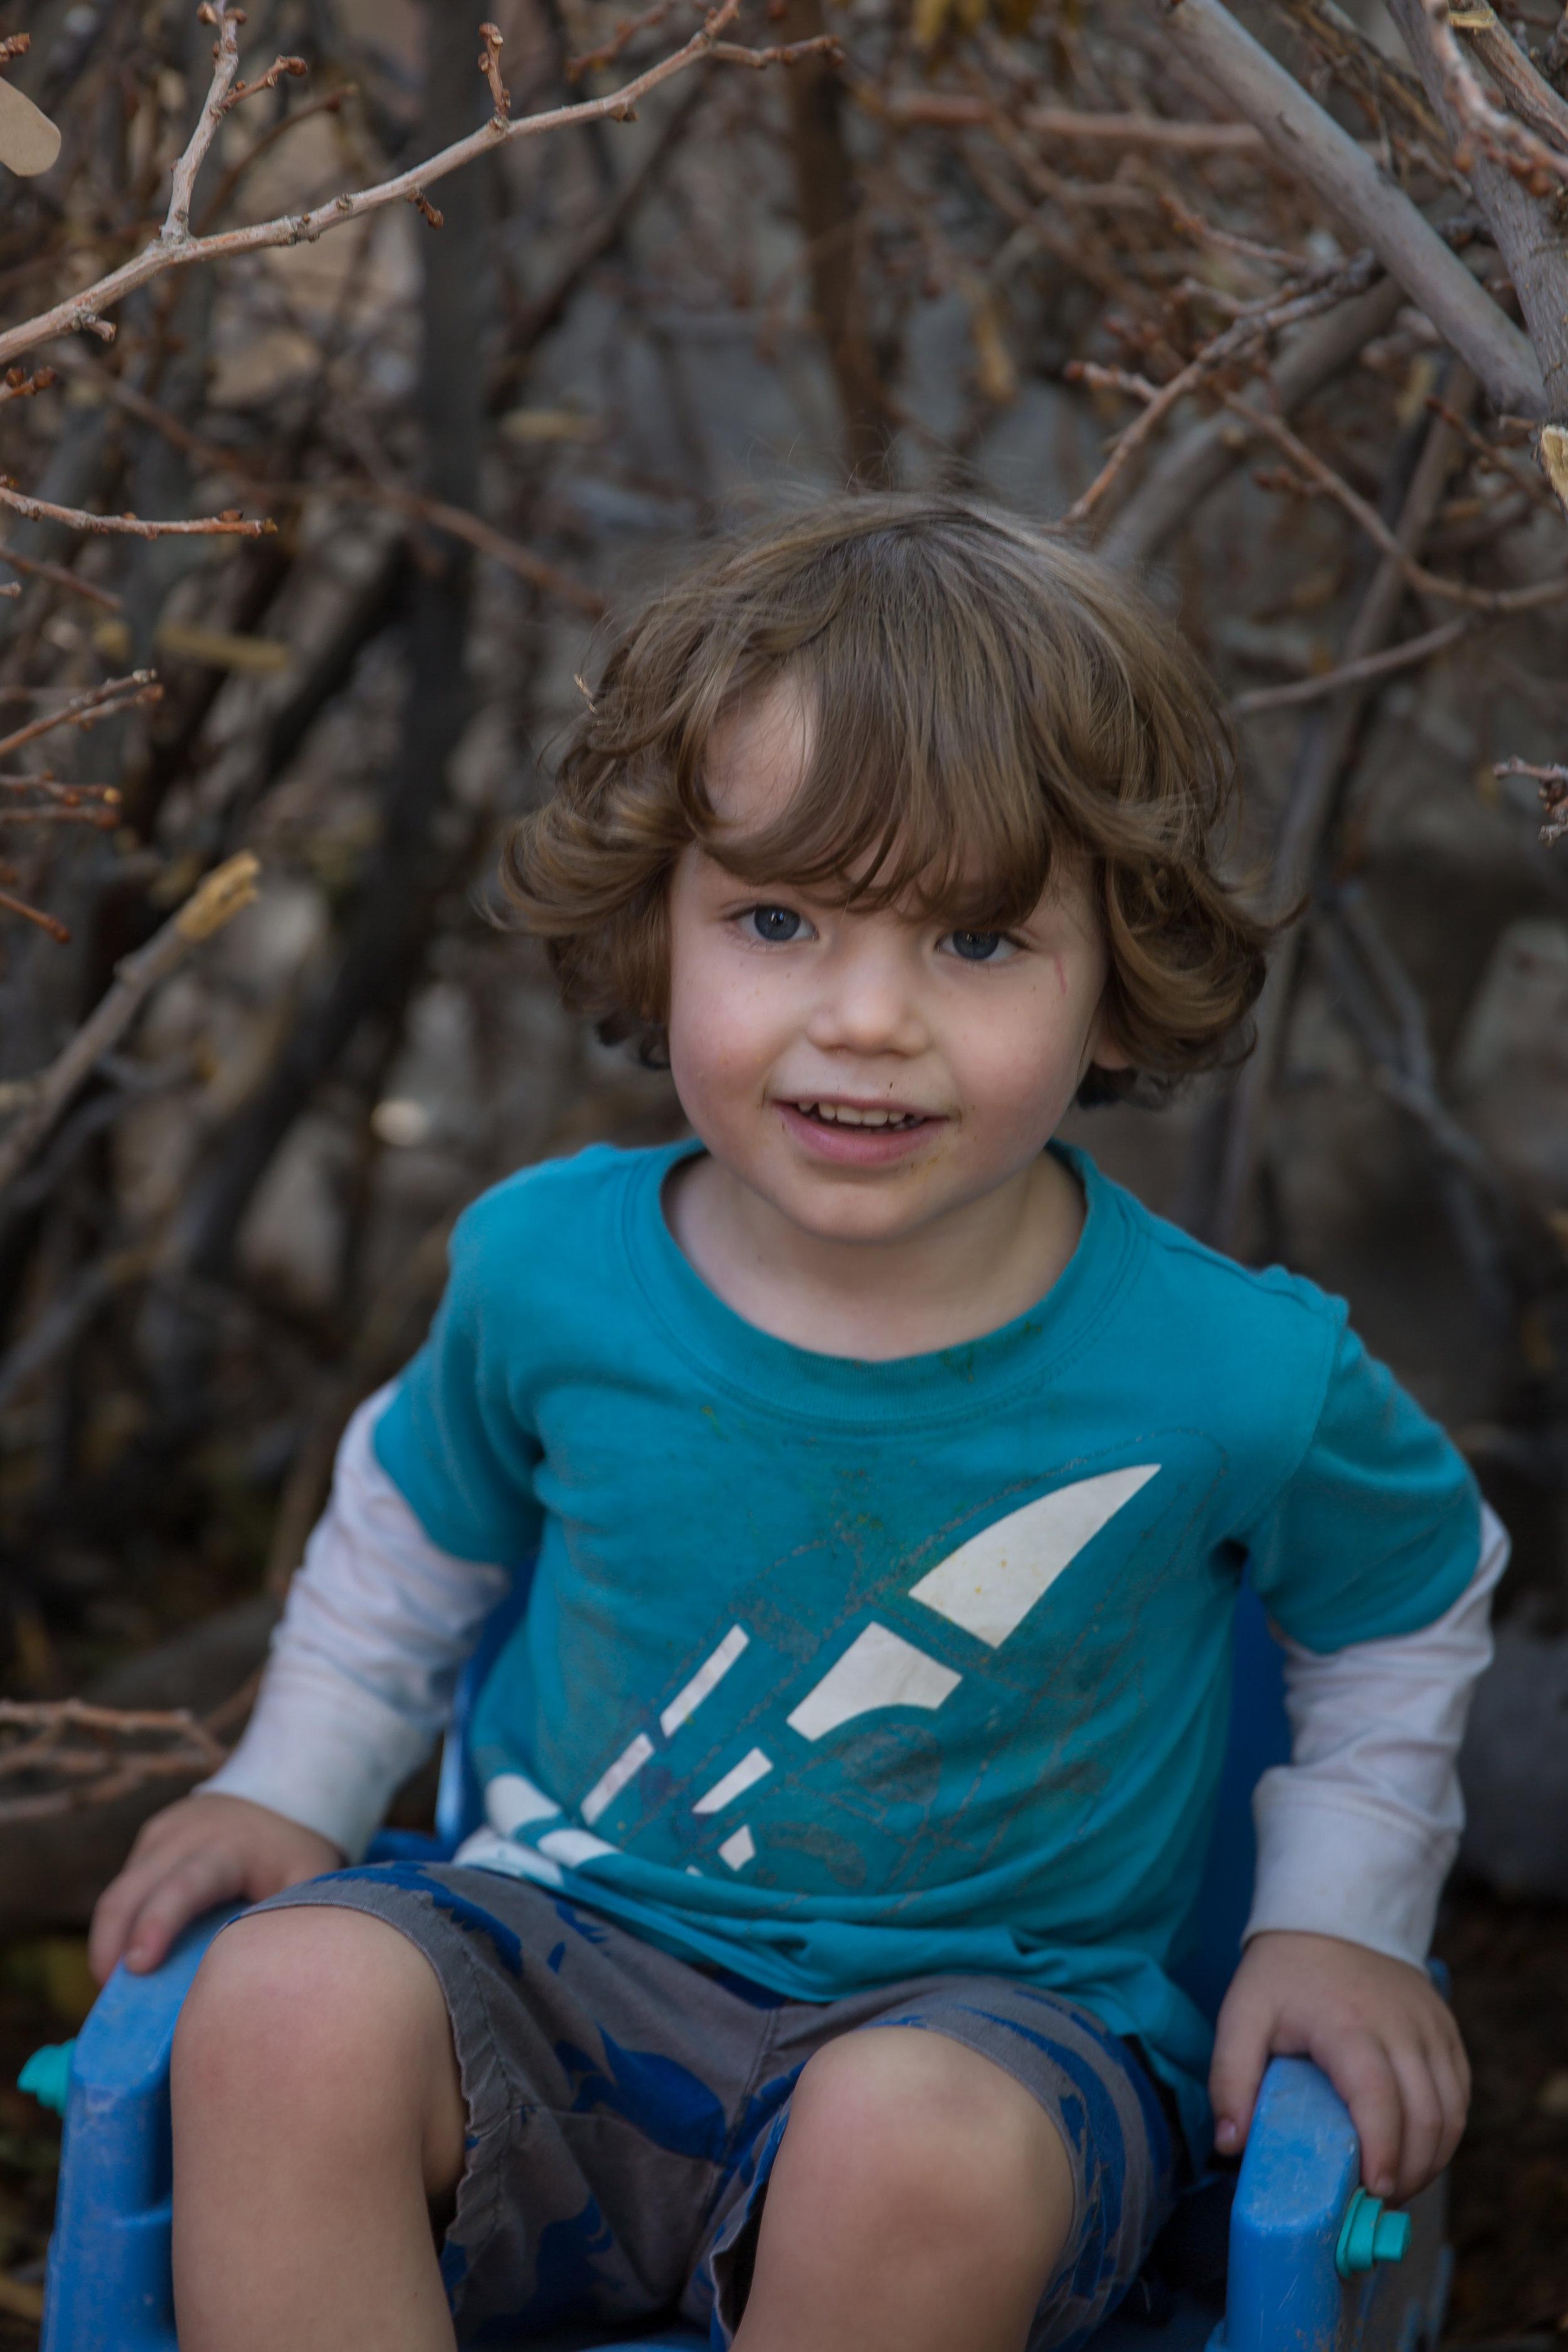 Child portrait example